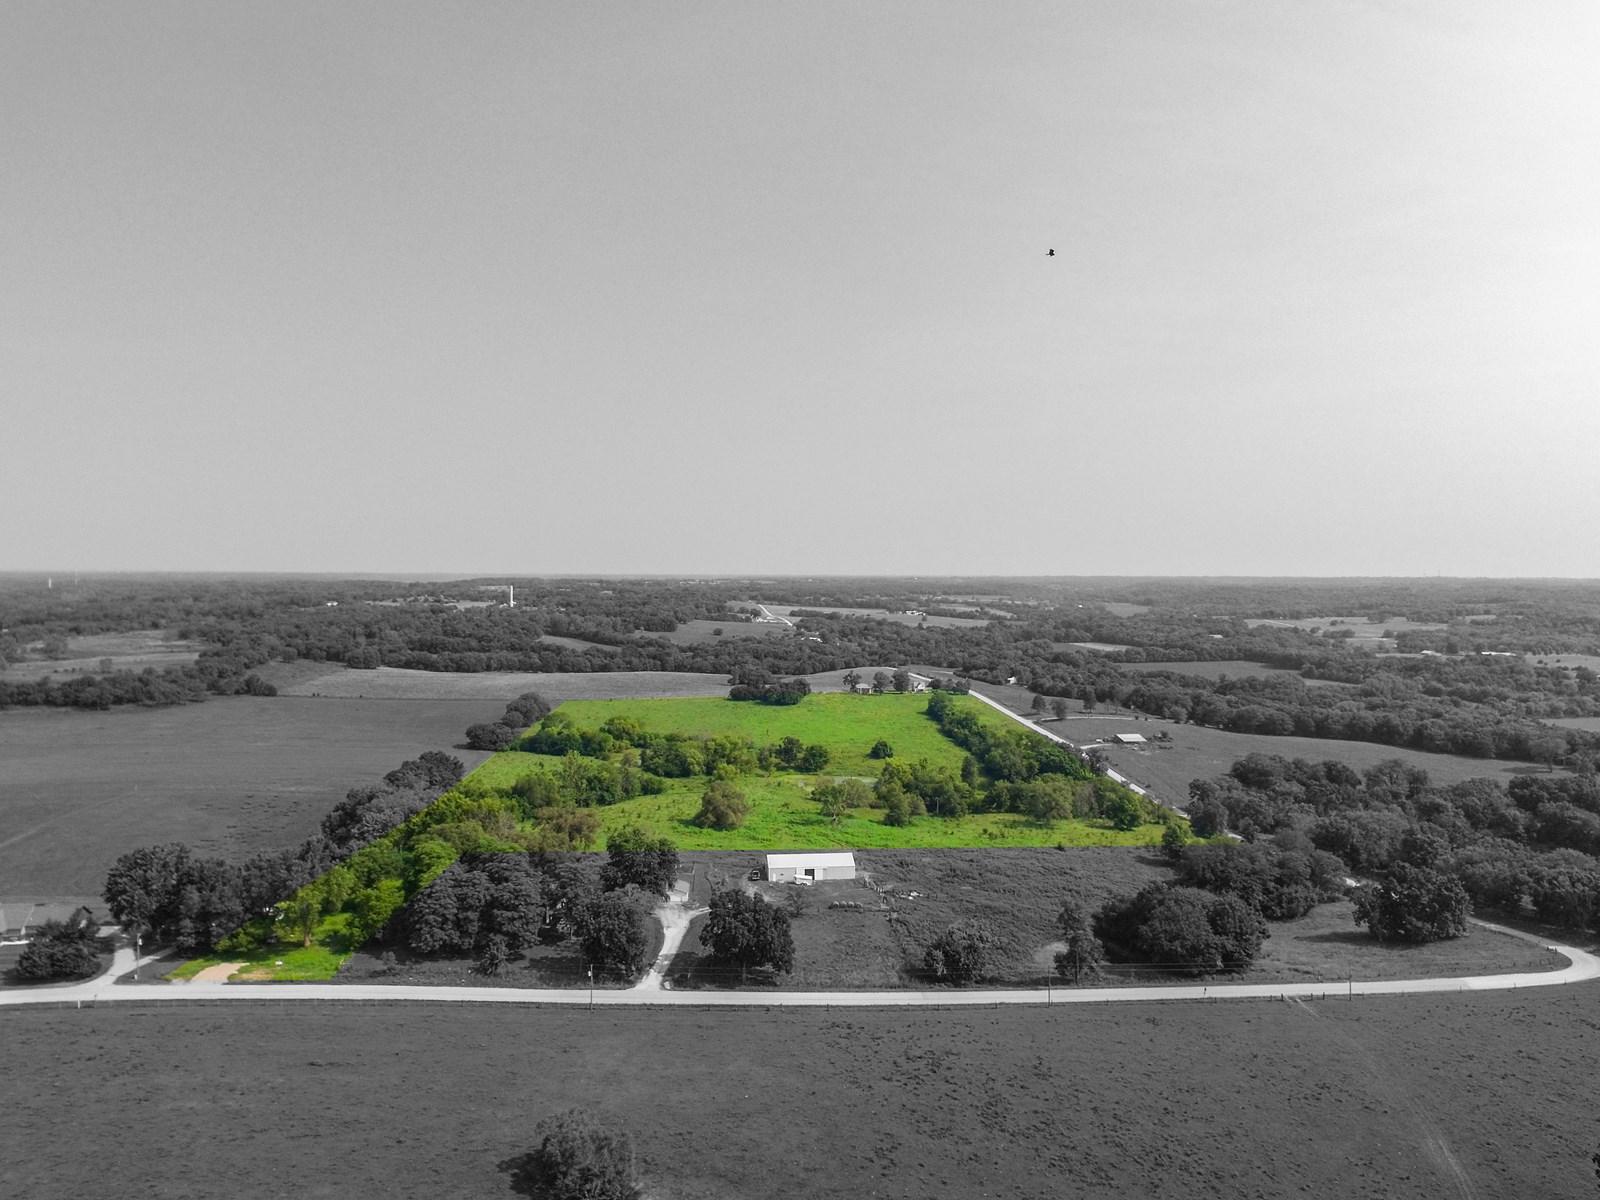 Kansas Land for Sale, Jefferson County Recreational Land